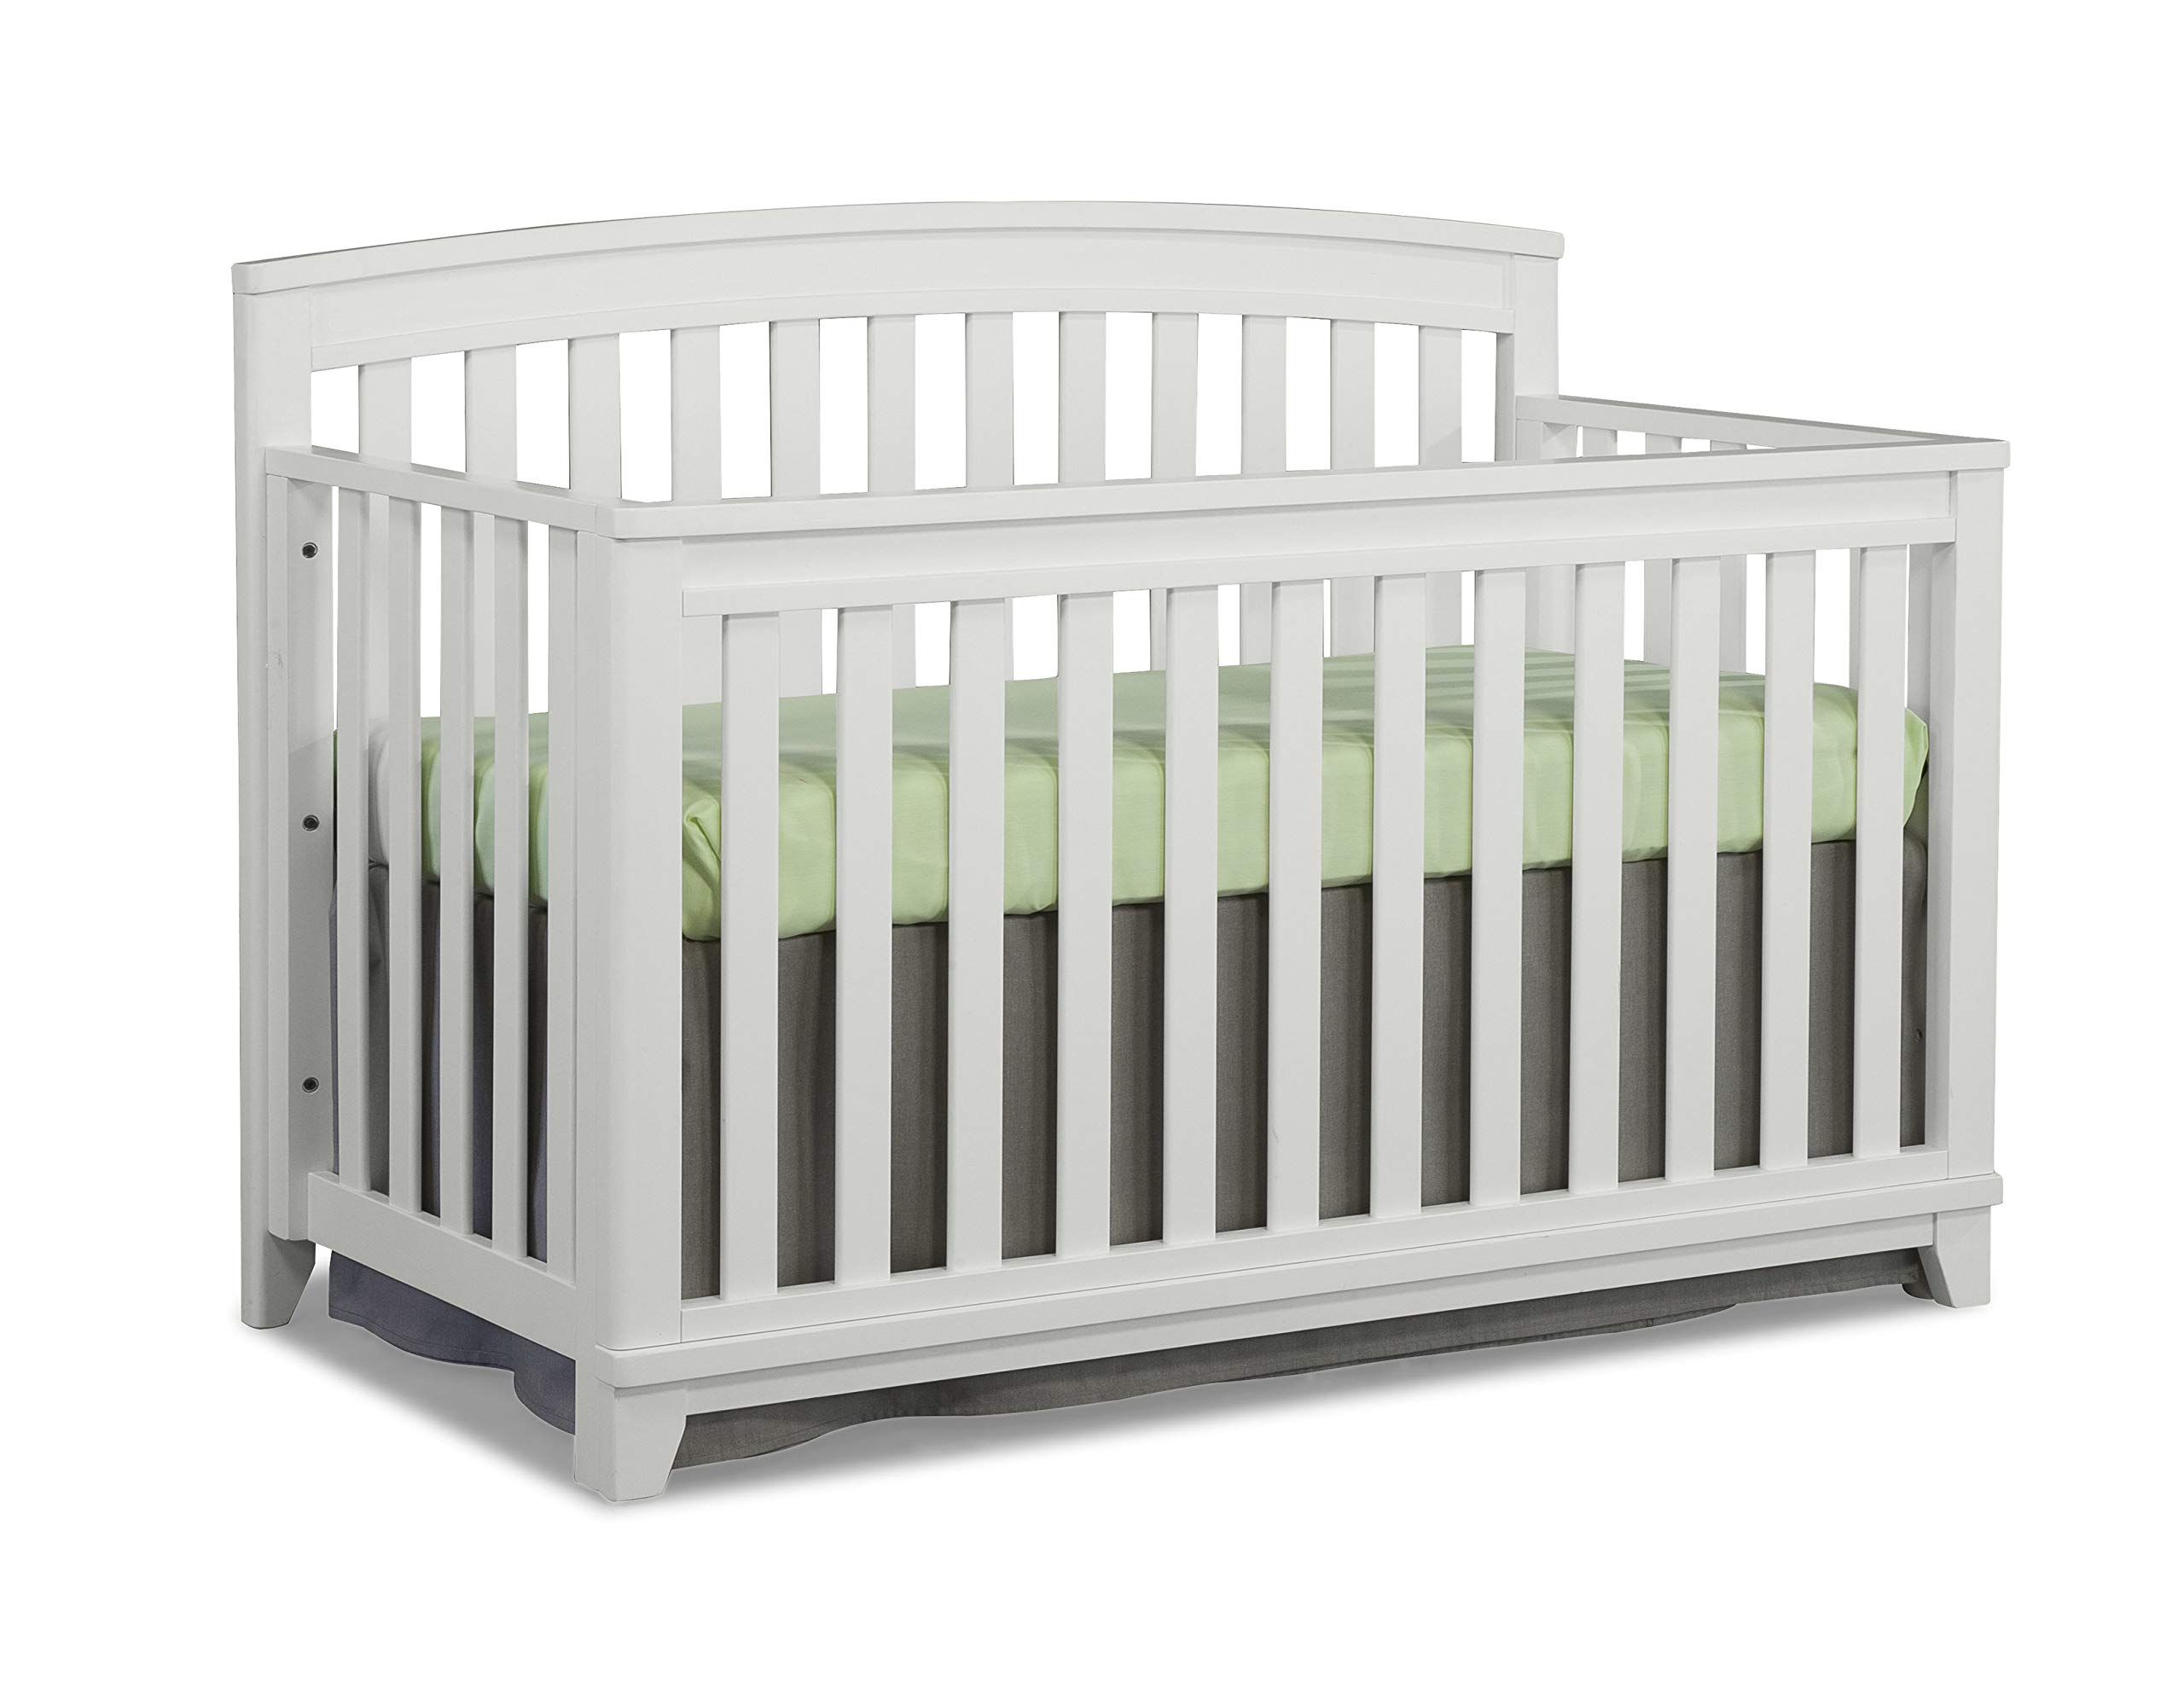 Full Size Conversion Kit Bed Rails for Westwood Design Adelle, Jonesport, Midtown (Imagio Baby) Pine Ridge, Stone Harbor & Wyatt Cribs (White)